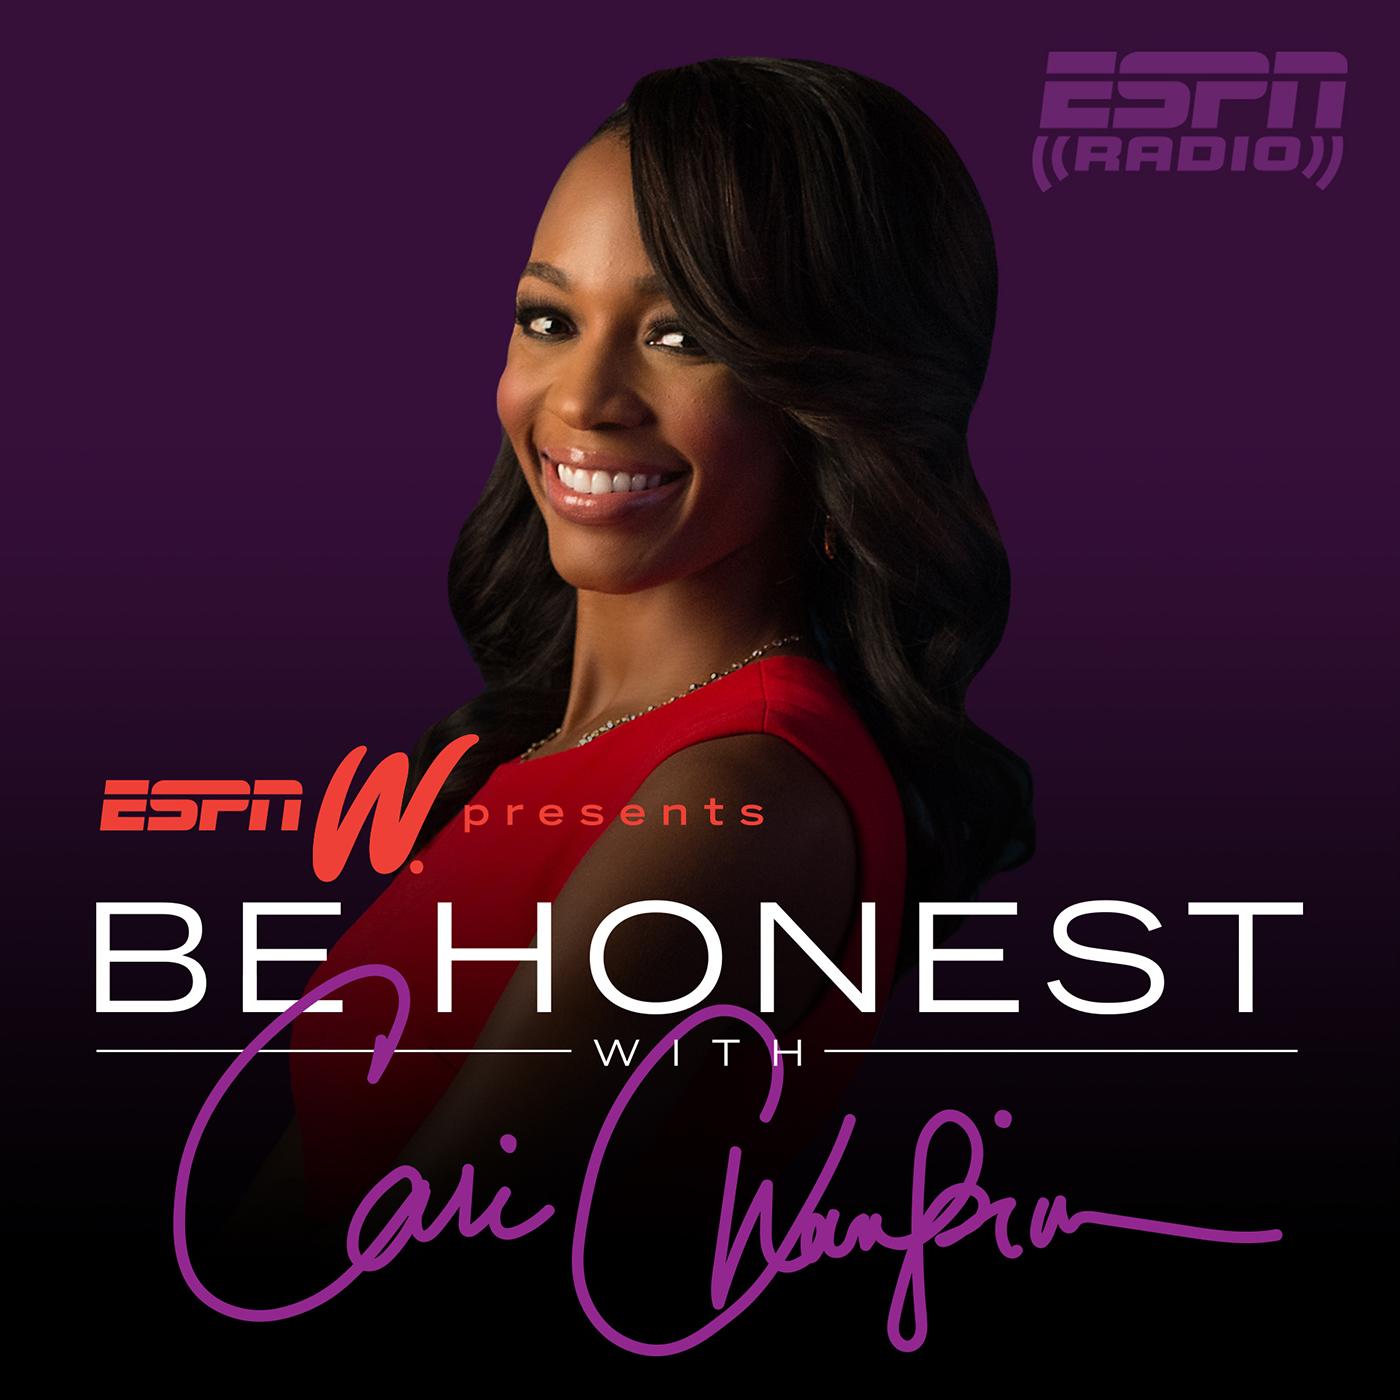 espnW presents Be Honest with Cari Champion